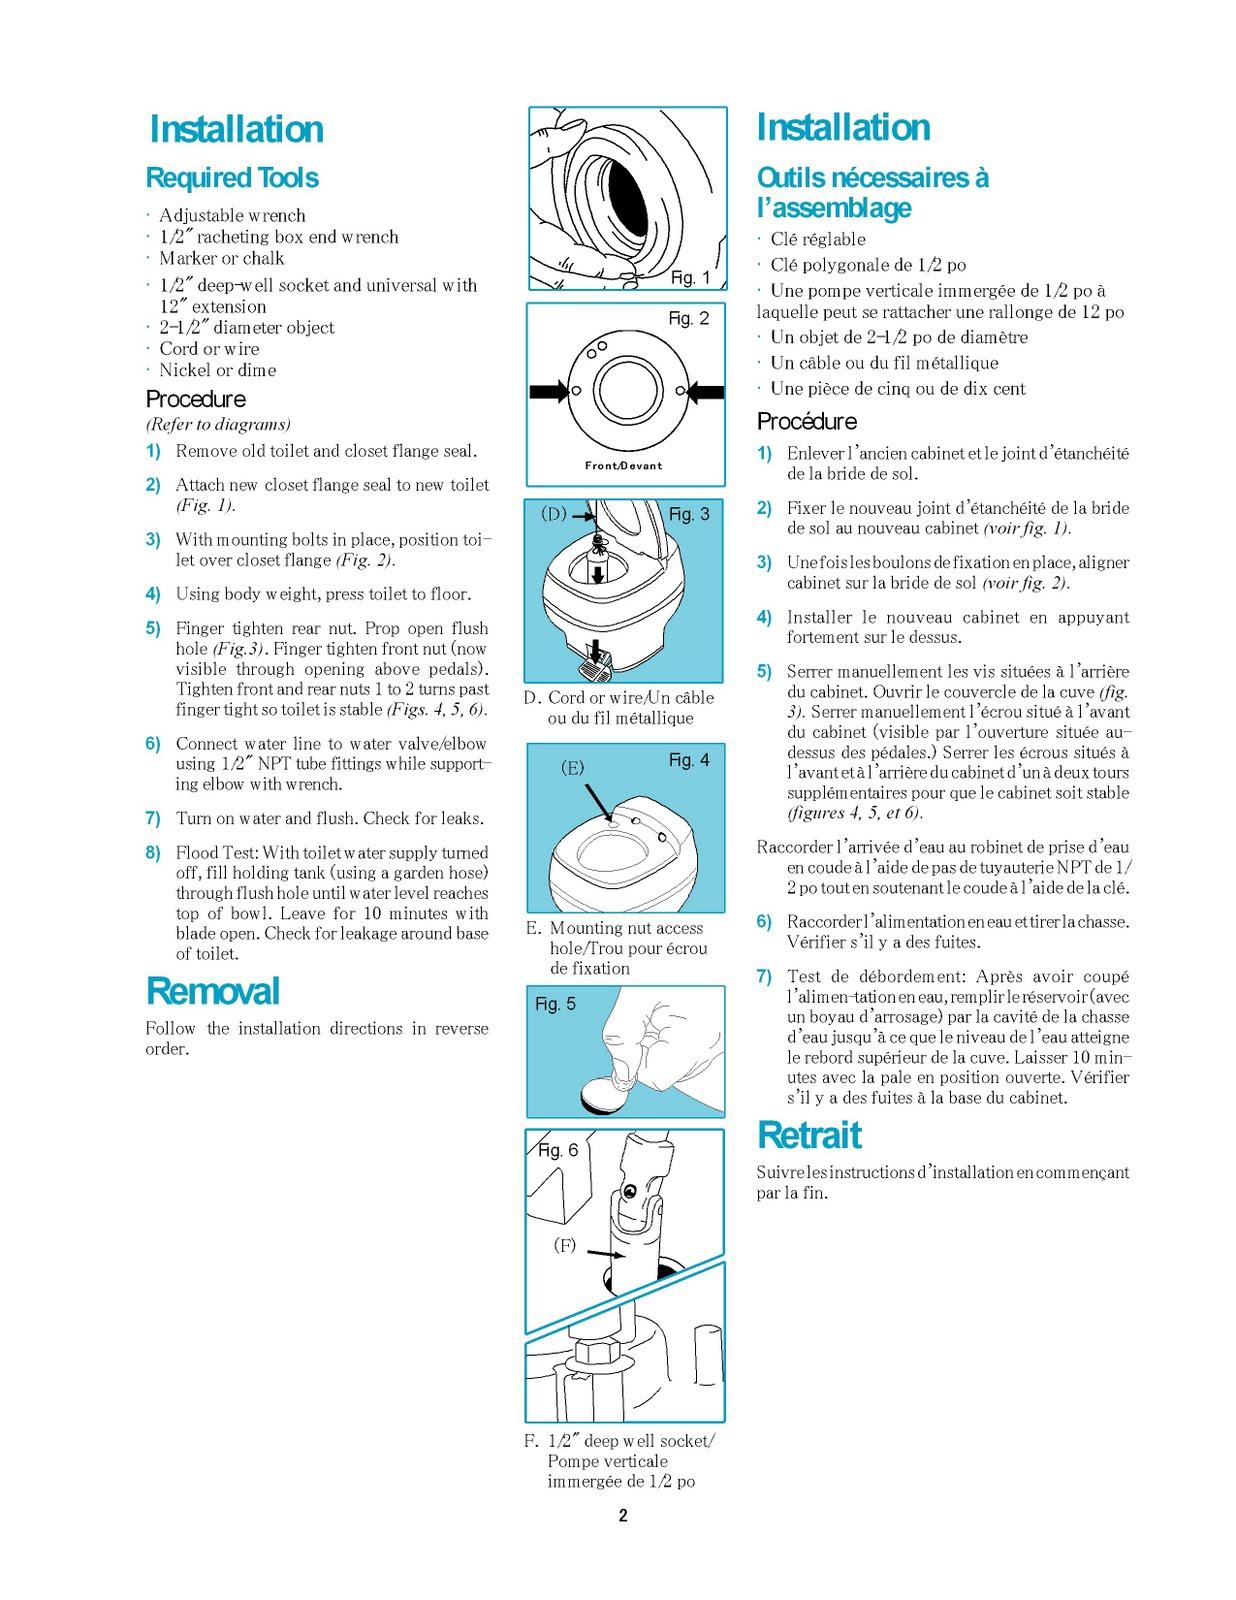 Thetford C200 Toilet Wiring Diagram 2000 Vw Jetta Stereo 30 Images